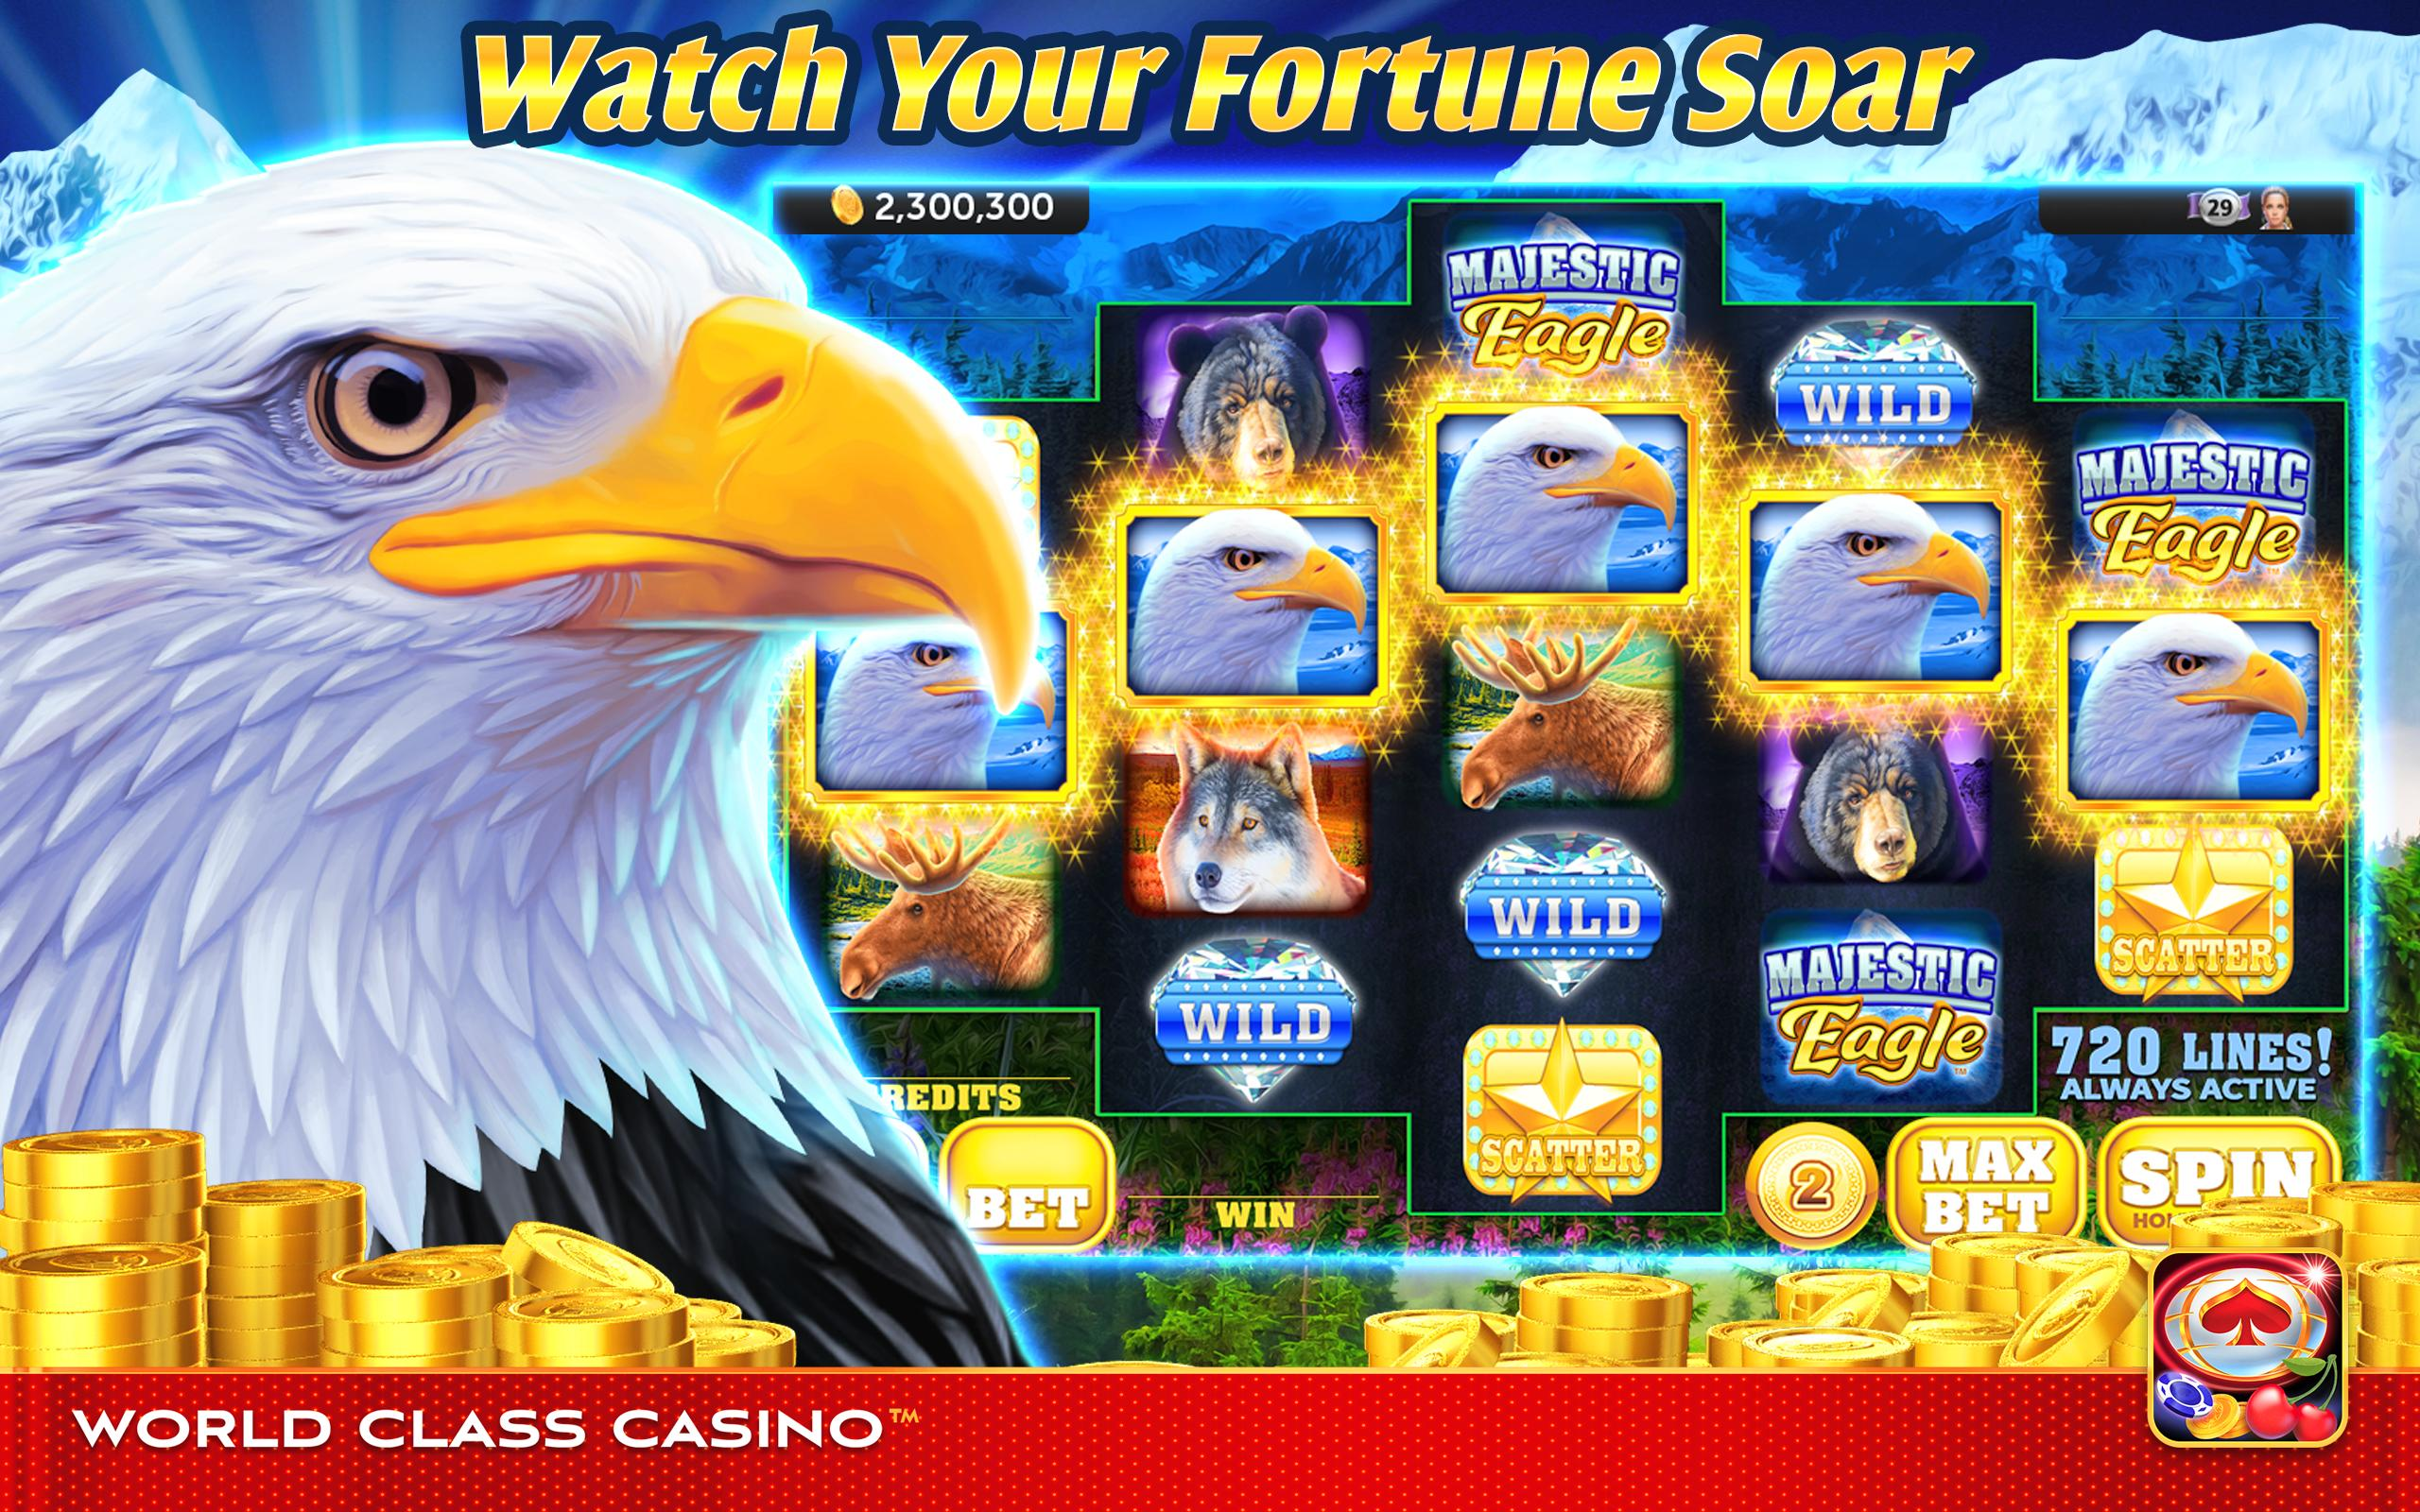 World Class Casino Slots, Blackjack & Poker Room 8.0.4 Screenshot 21